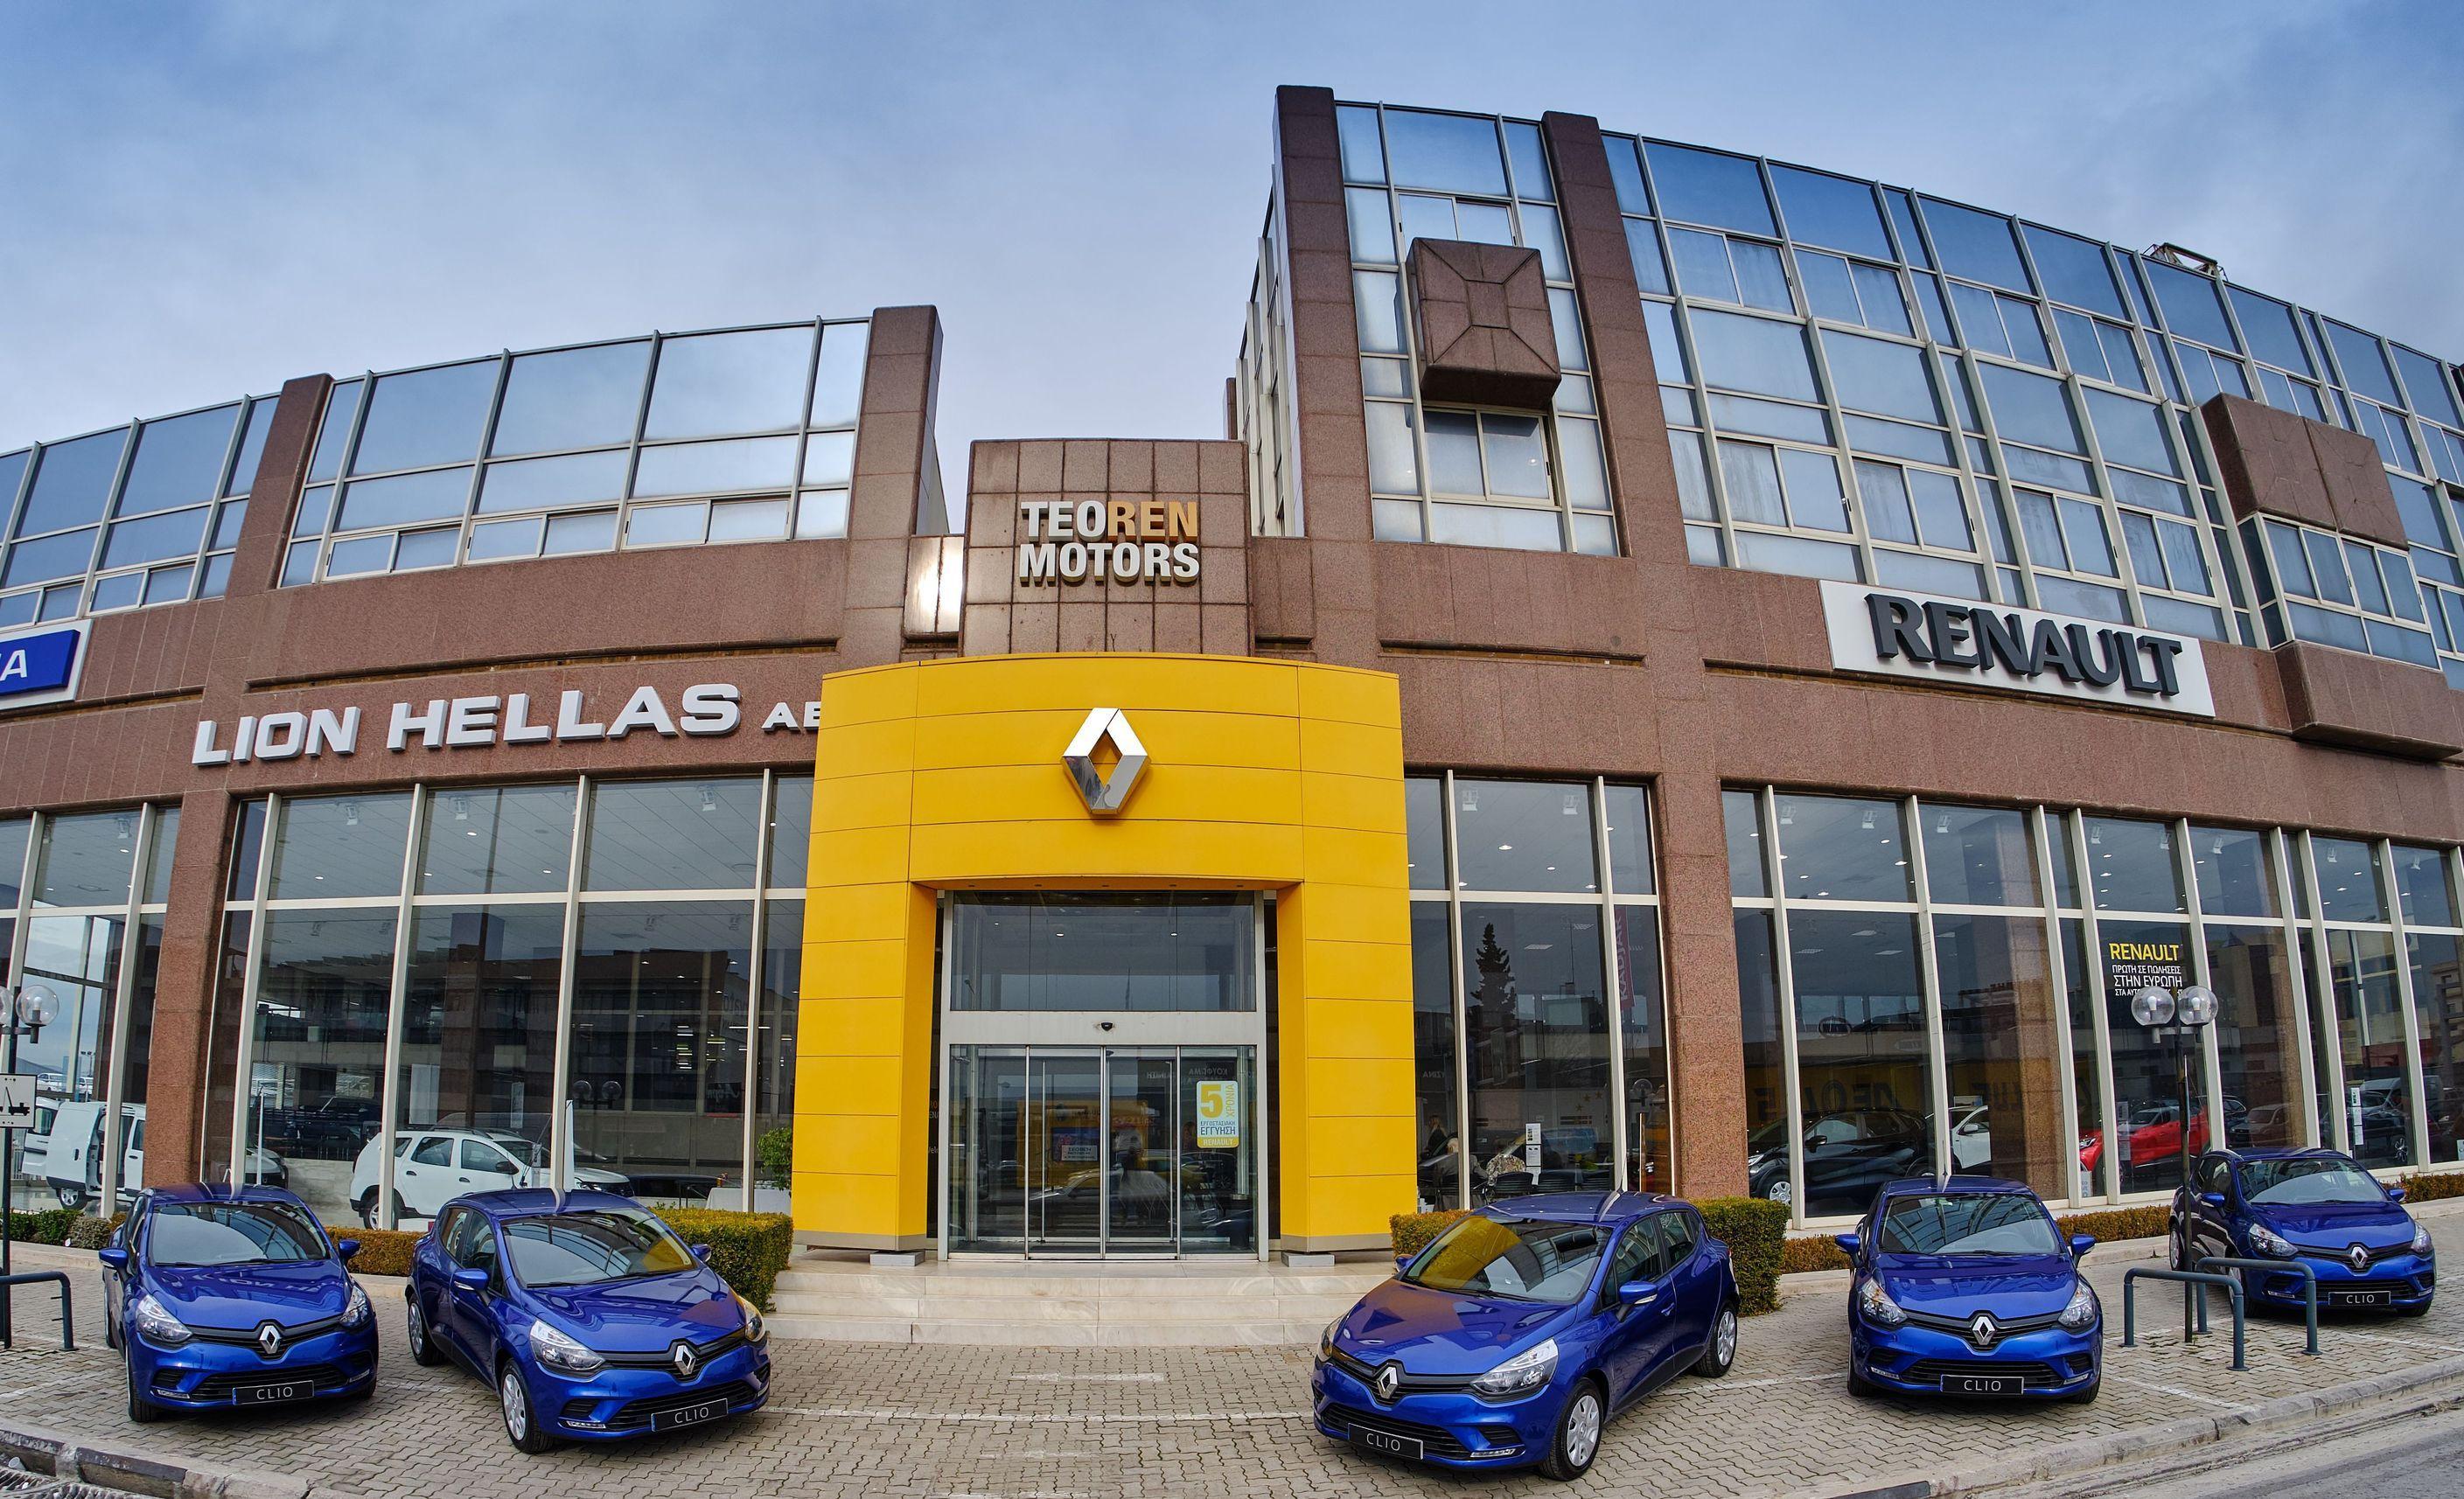 H Renault παρέδωσε στους πυρόπληκτους στο Μάτι πέντε CLIO